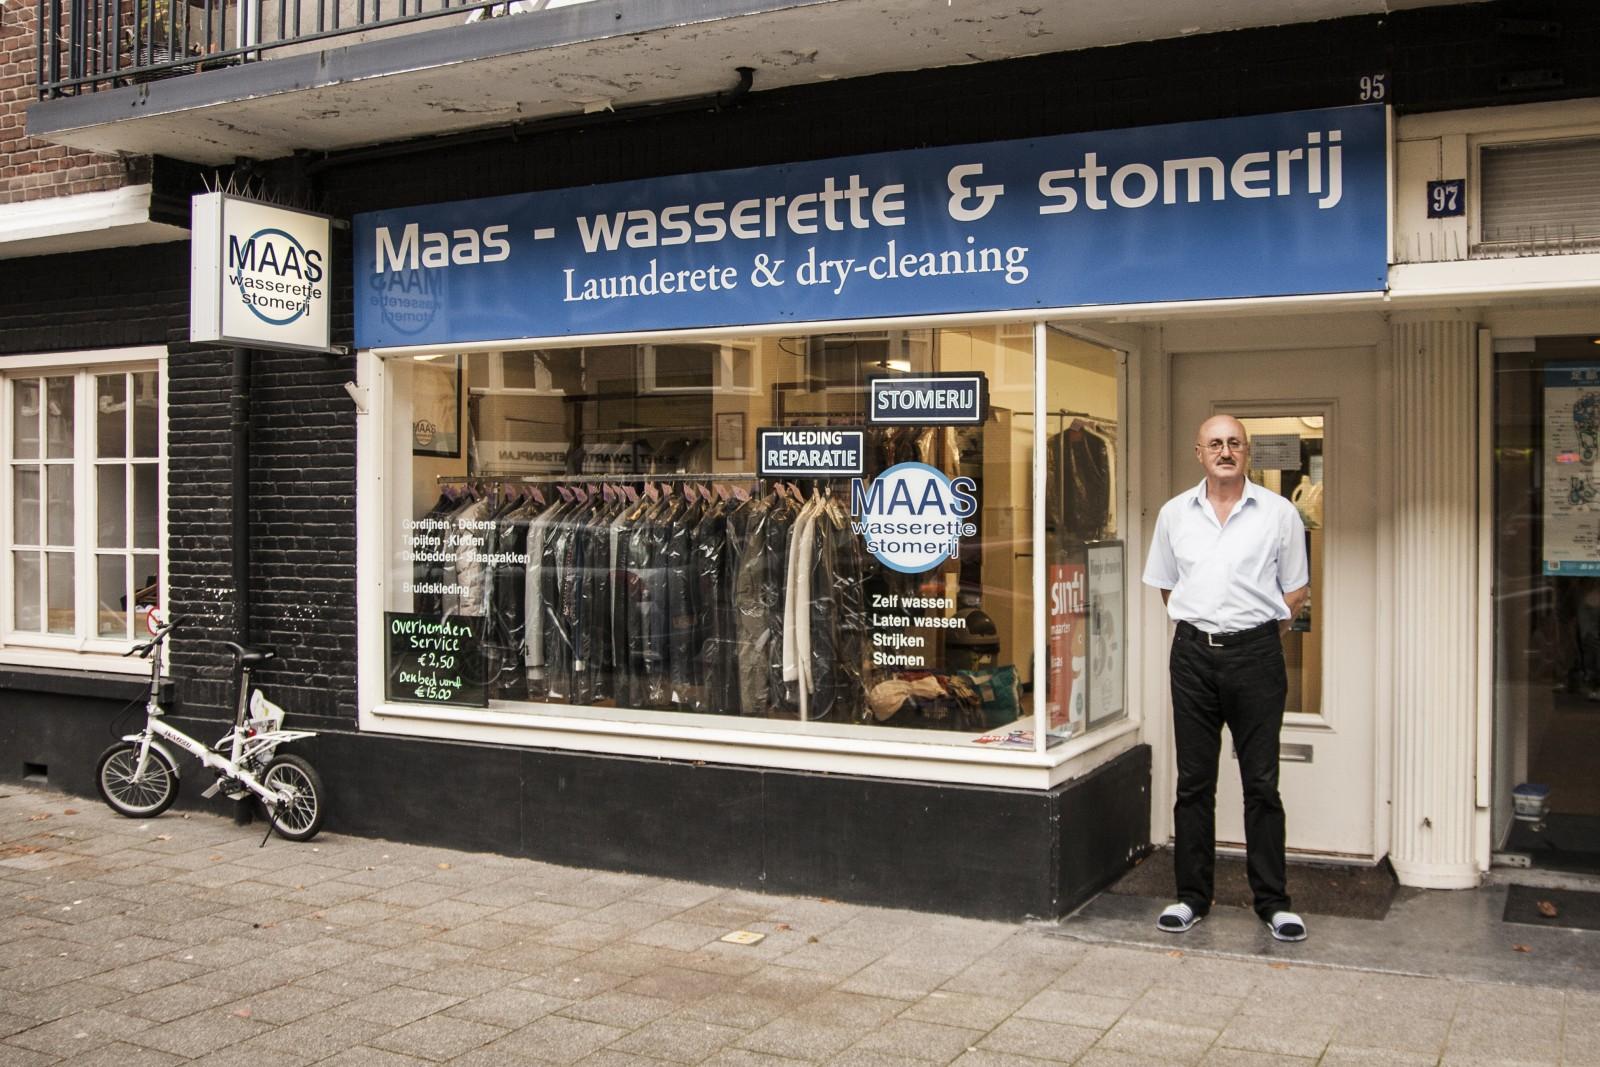 Maas wasserette